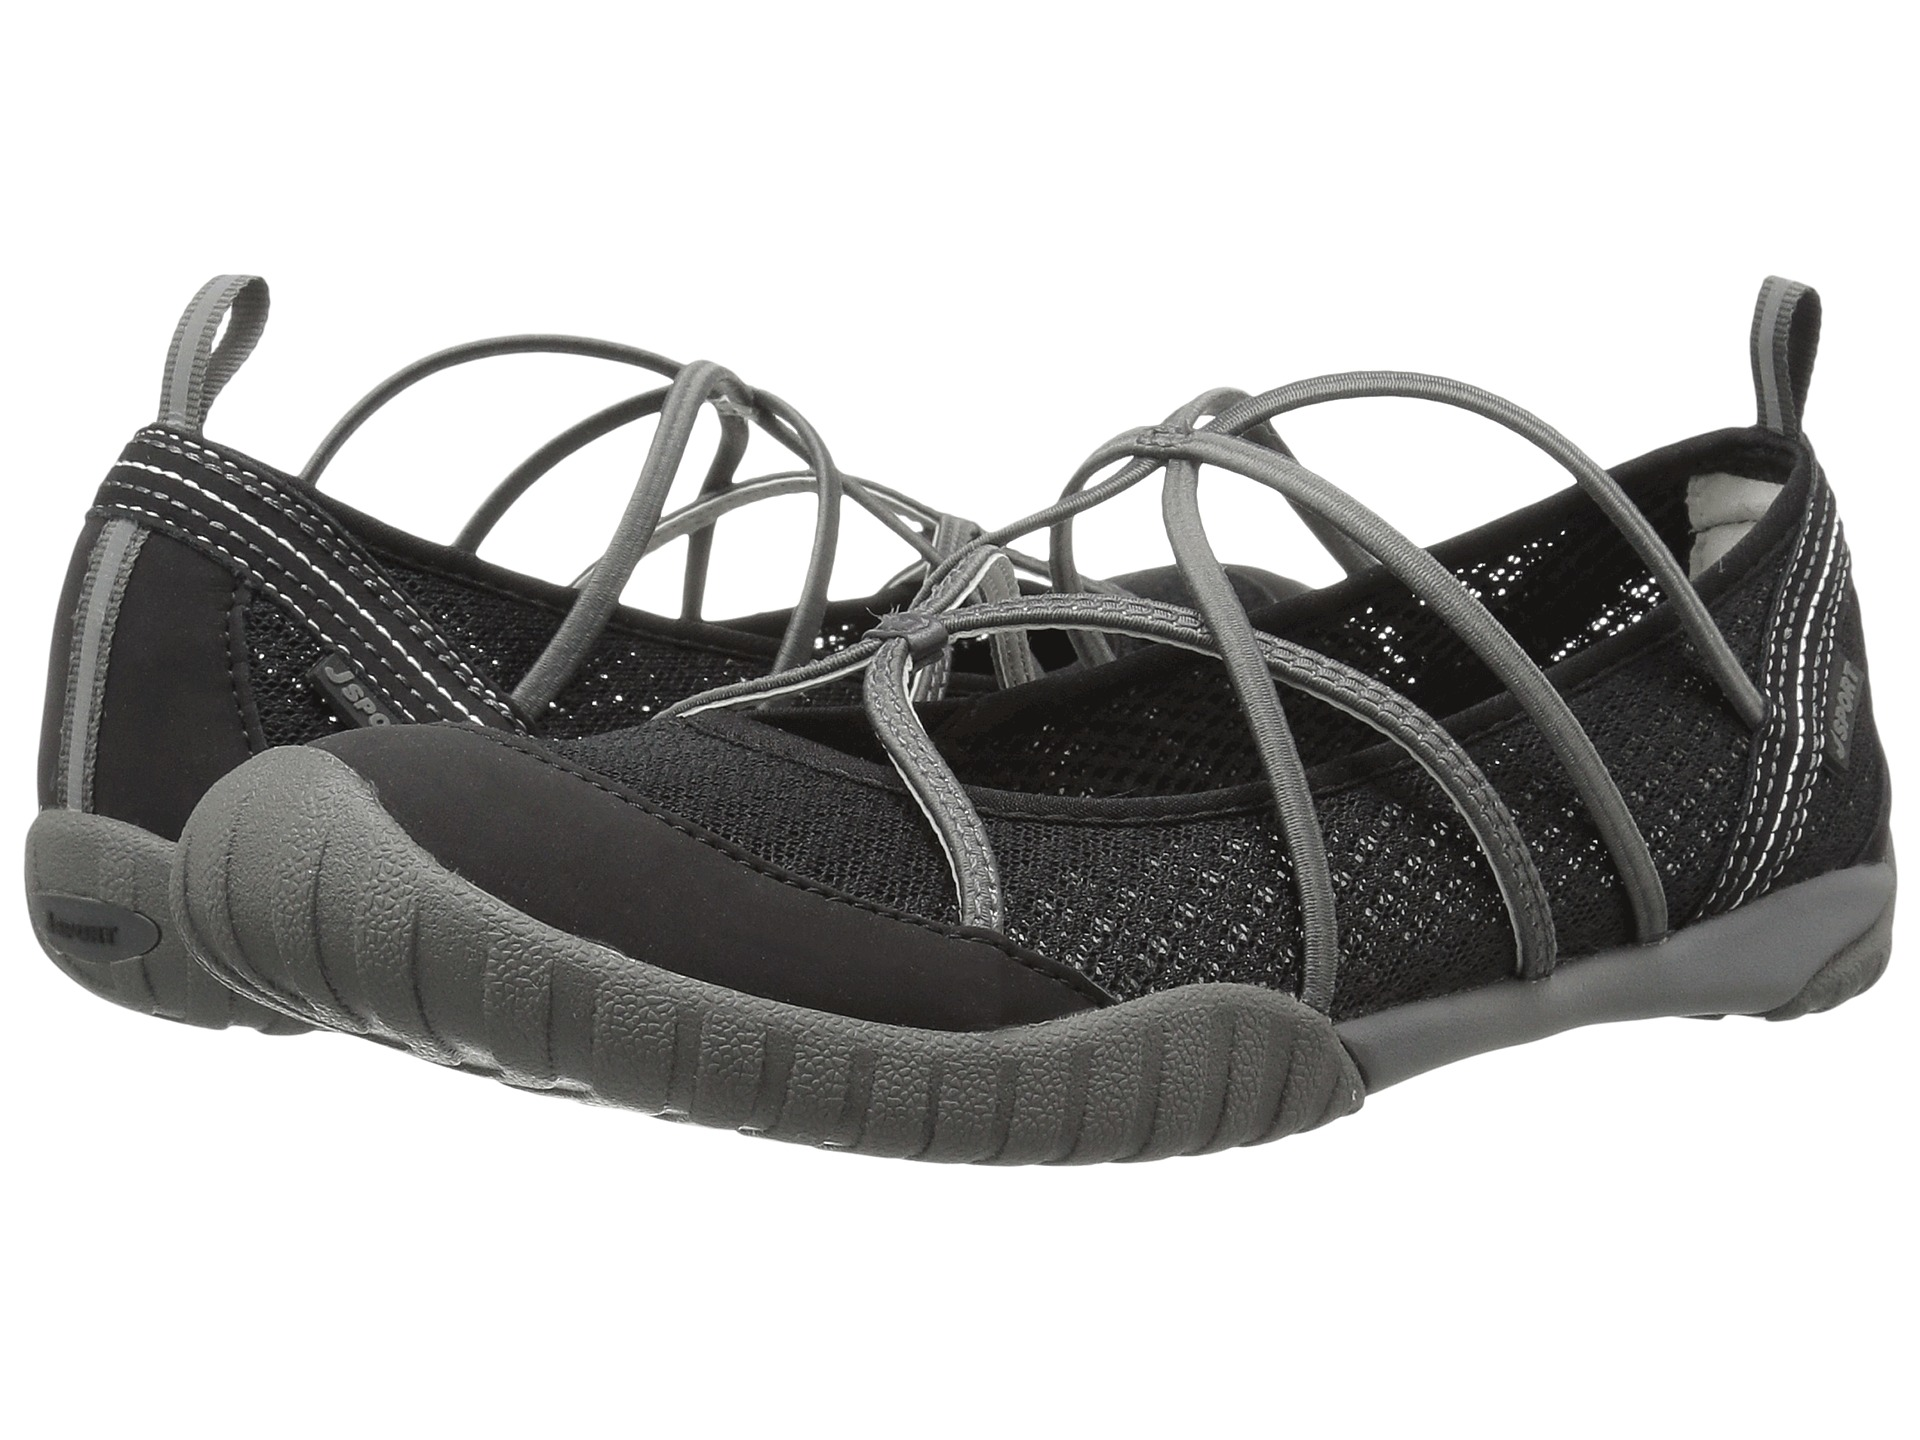 Jbu Water Ready Shoes Reviews